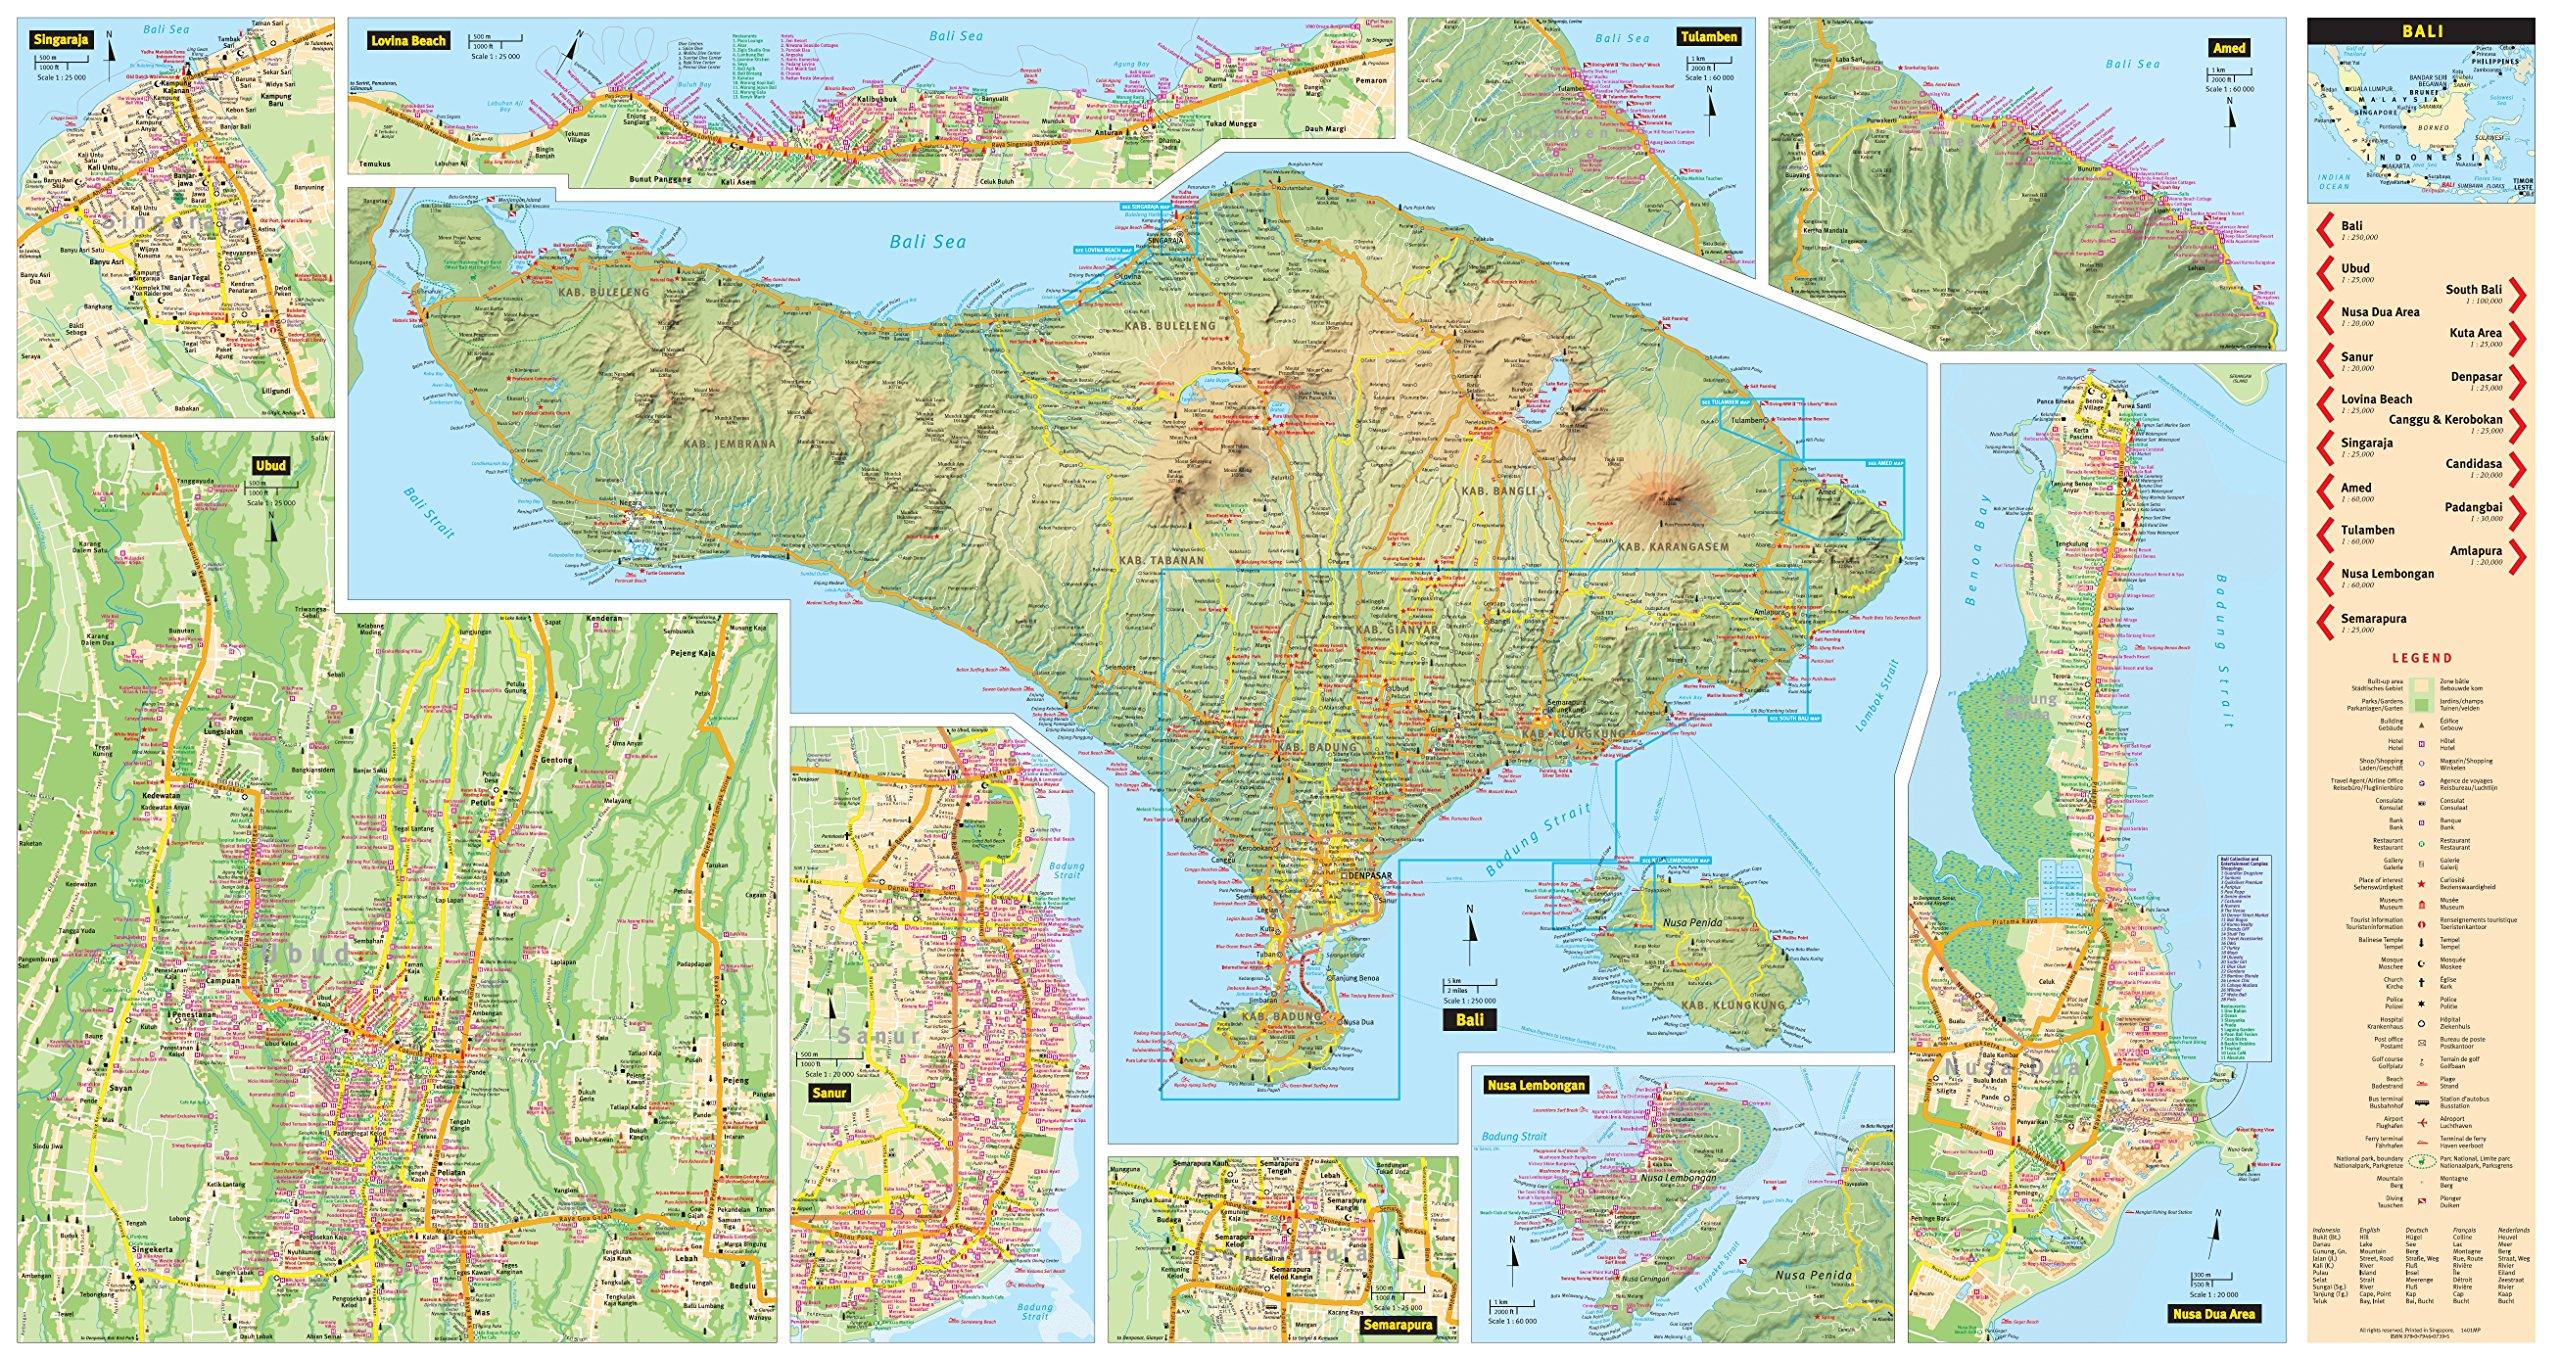 Bali Travel Map Ninth Edition (Periplus Travel Maps ... on denpasar map, kuta map, bora bora map, china map, flores map, bali pictures, bhutan map, pacific map, japan map, kuala lumpur map, sulawesi map, new caledonia map, cambodia map, bali news, italy map, thailand map, cape town map, bali information, bali travel, java map, fiji map, world map, indonesia map, tahiti map,